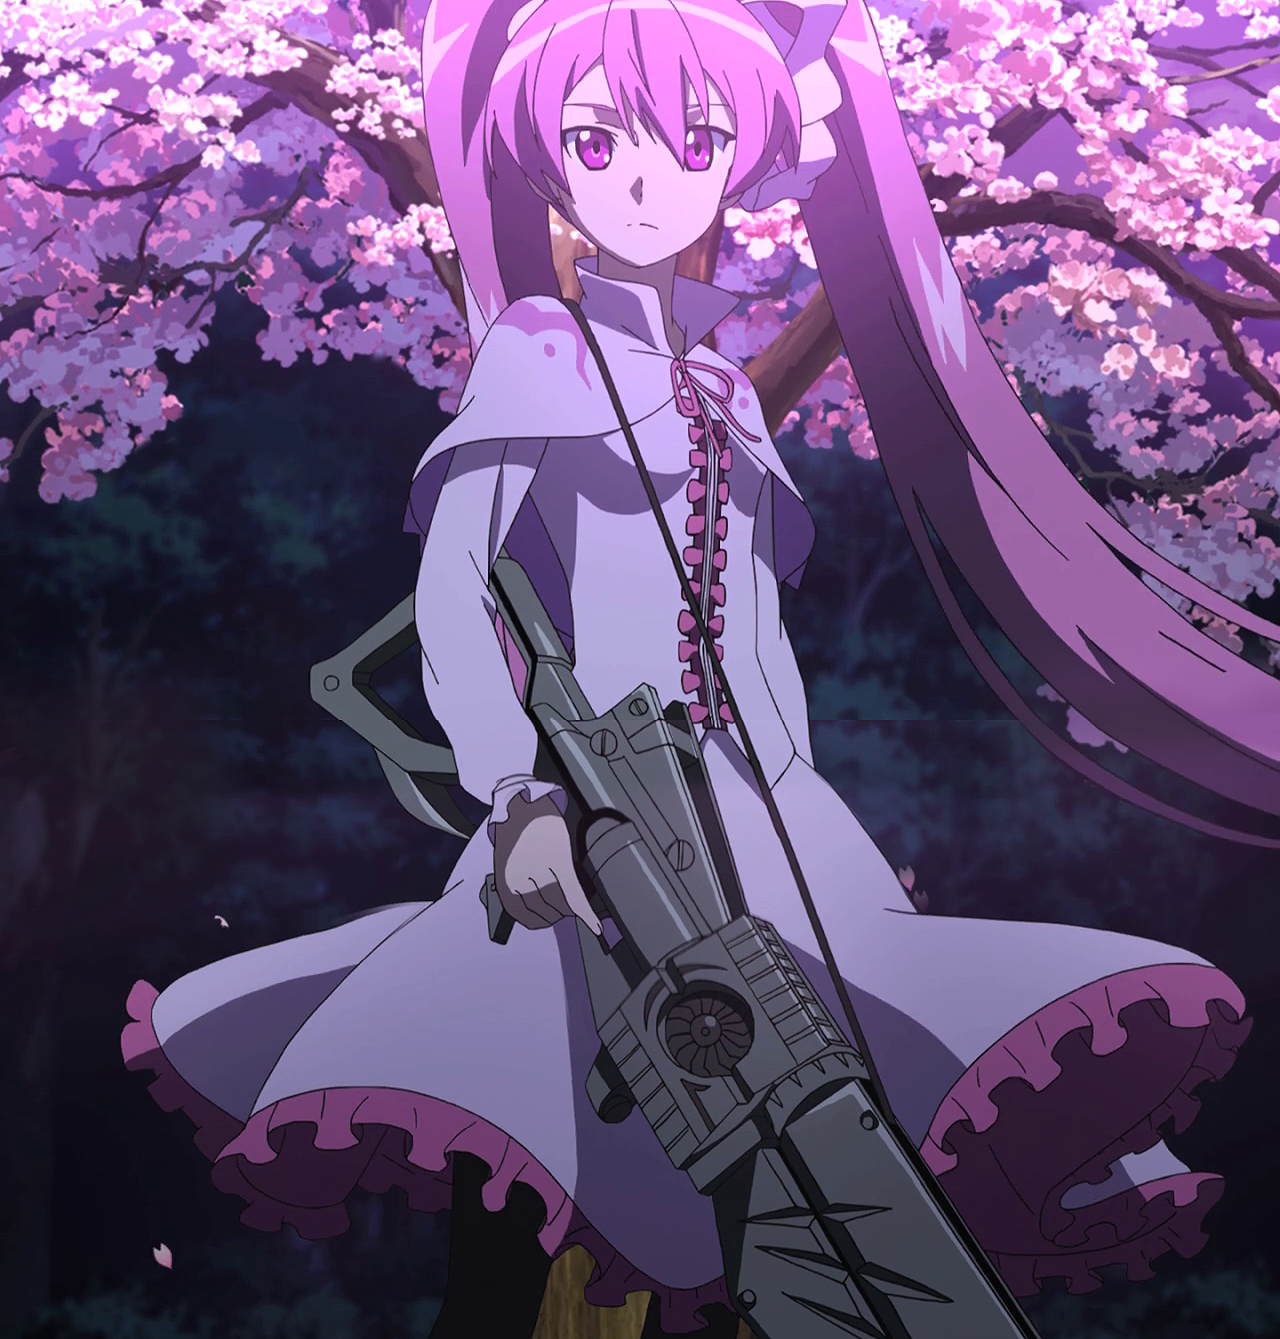 Afficher l'image d'origine | Anime mangas, Anime, Animé